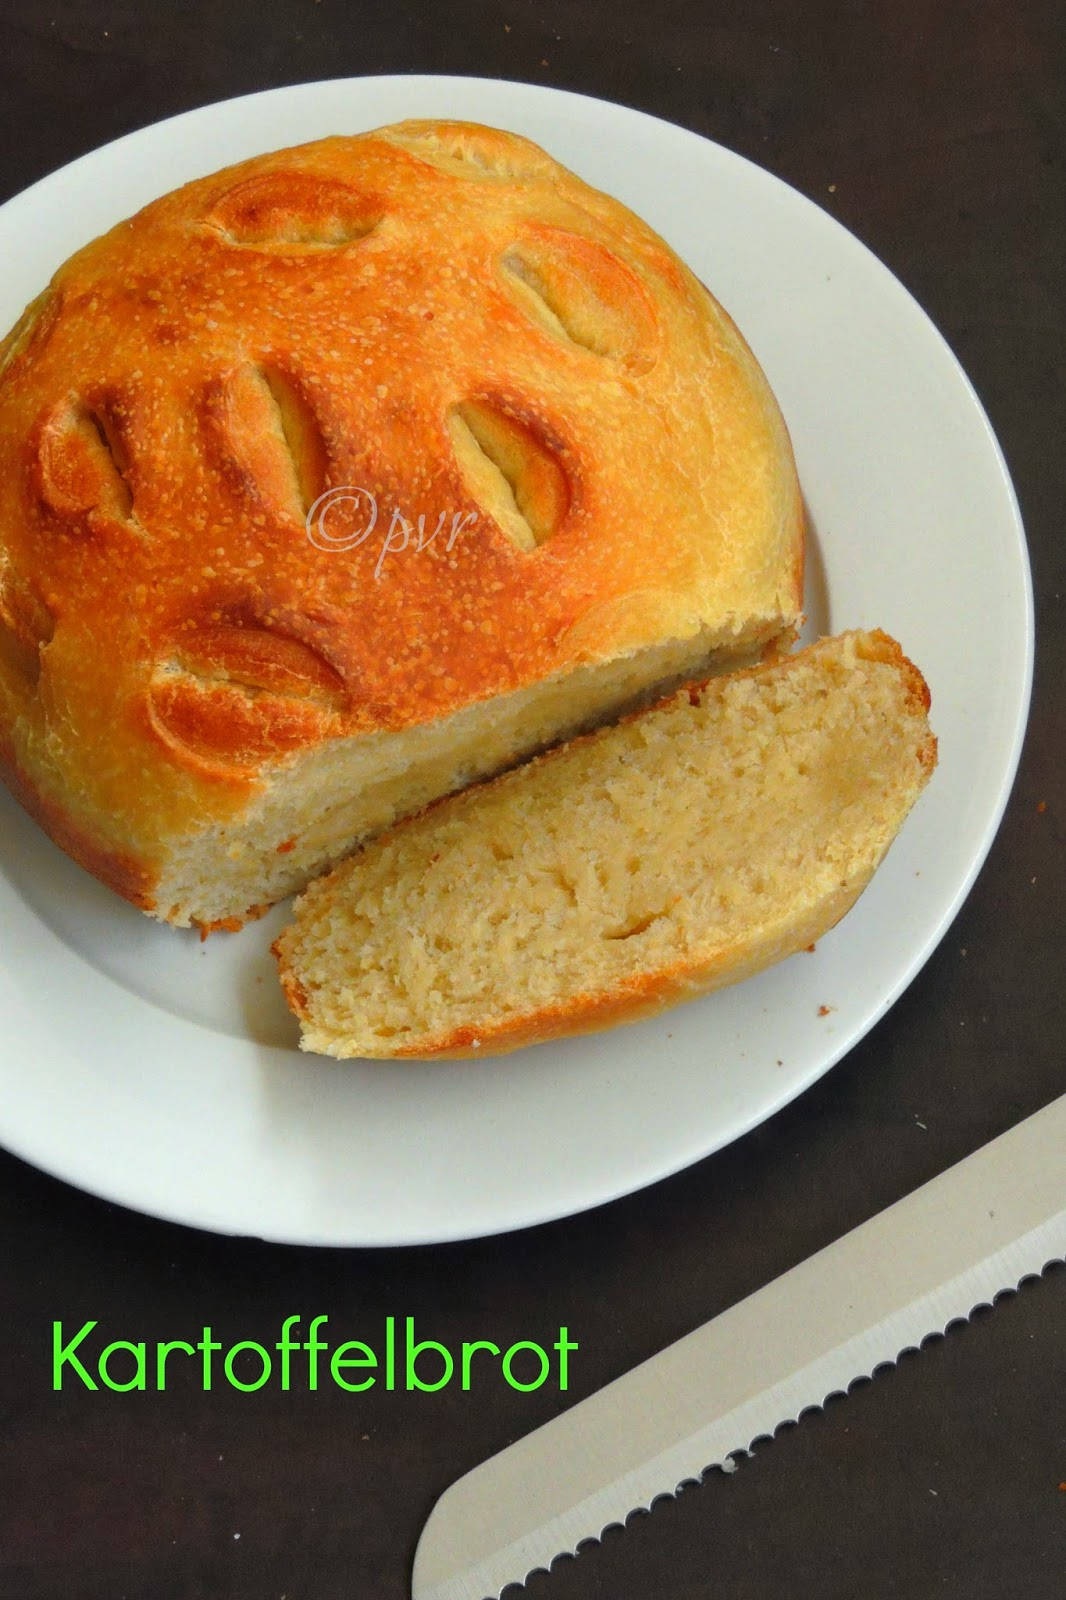 Vegan Kartoffelbrot,,German Potato Bread